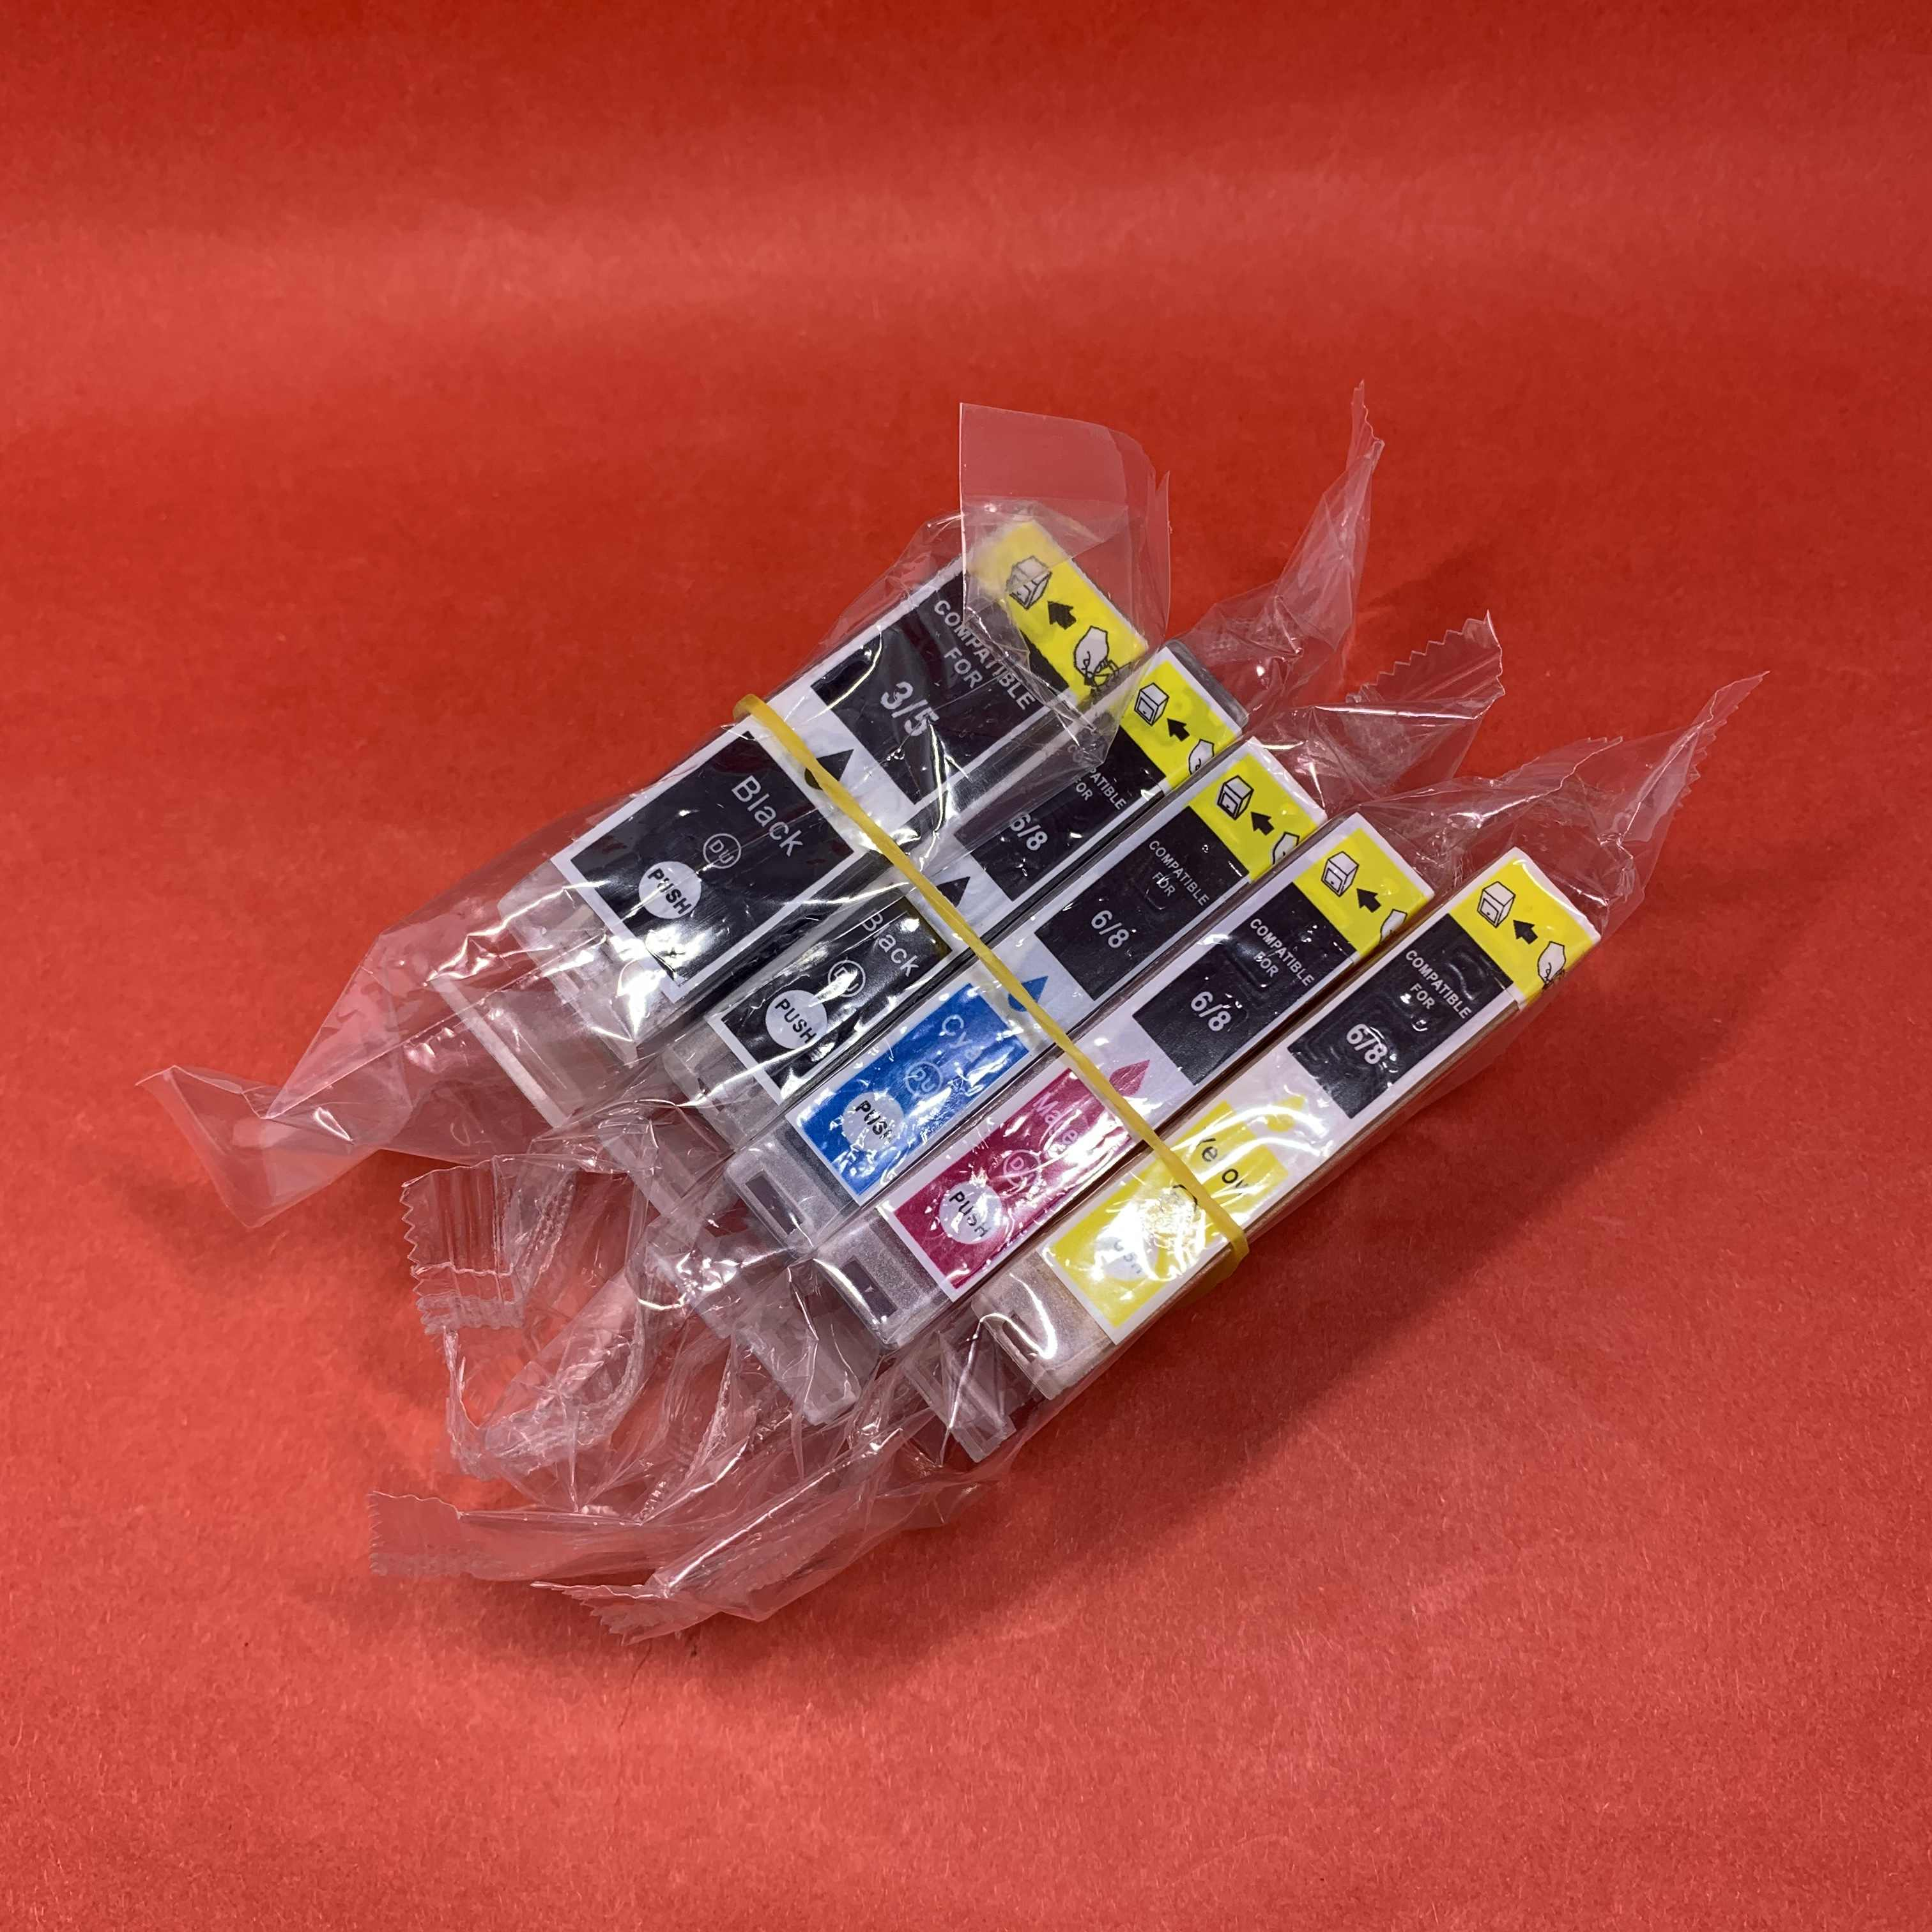 Yotat Compaible PGI5 Ink Cartridge PGI-5 CLI-8 untuk Canon PIXMA IP3300/IP3500/IP4200/IP4200 RFB/IP4300 /IP4500/IP5200/IP5200R